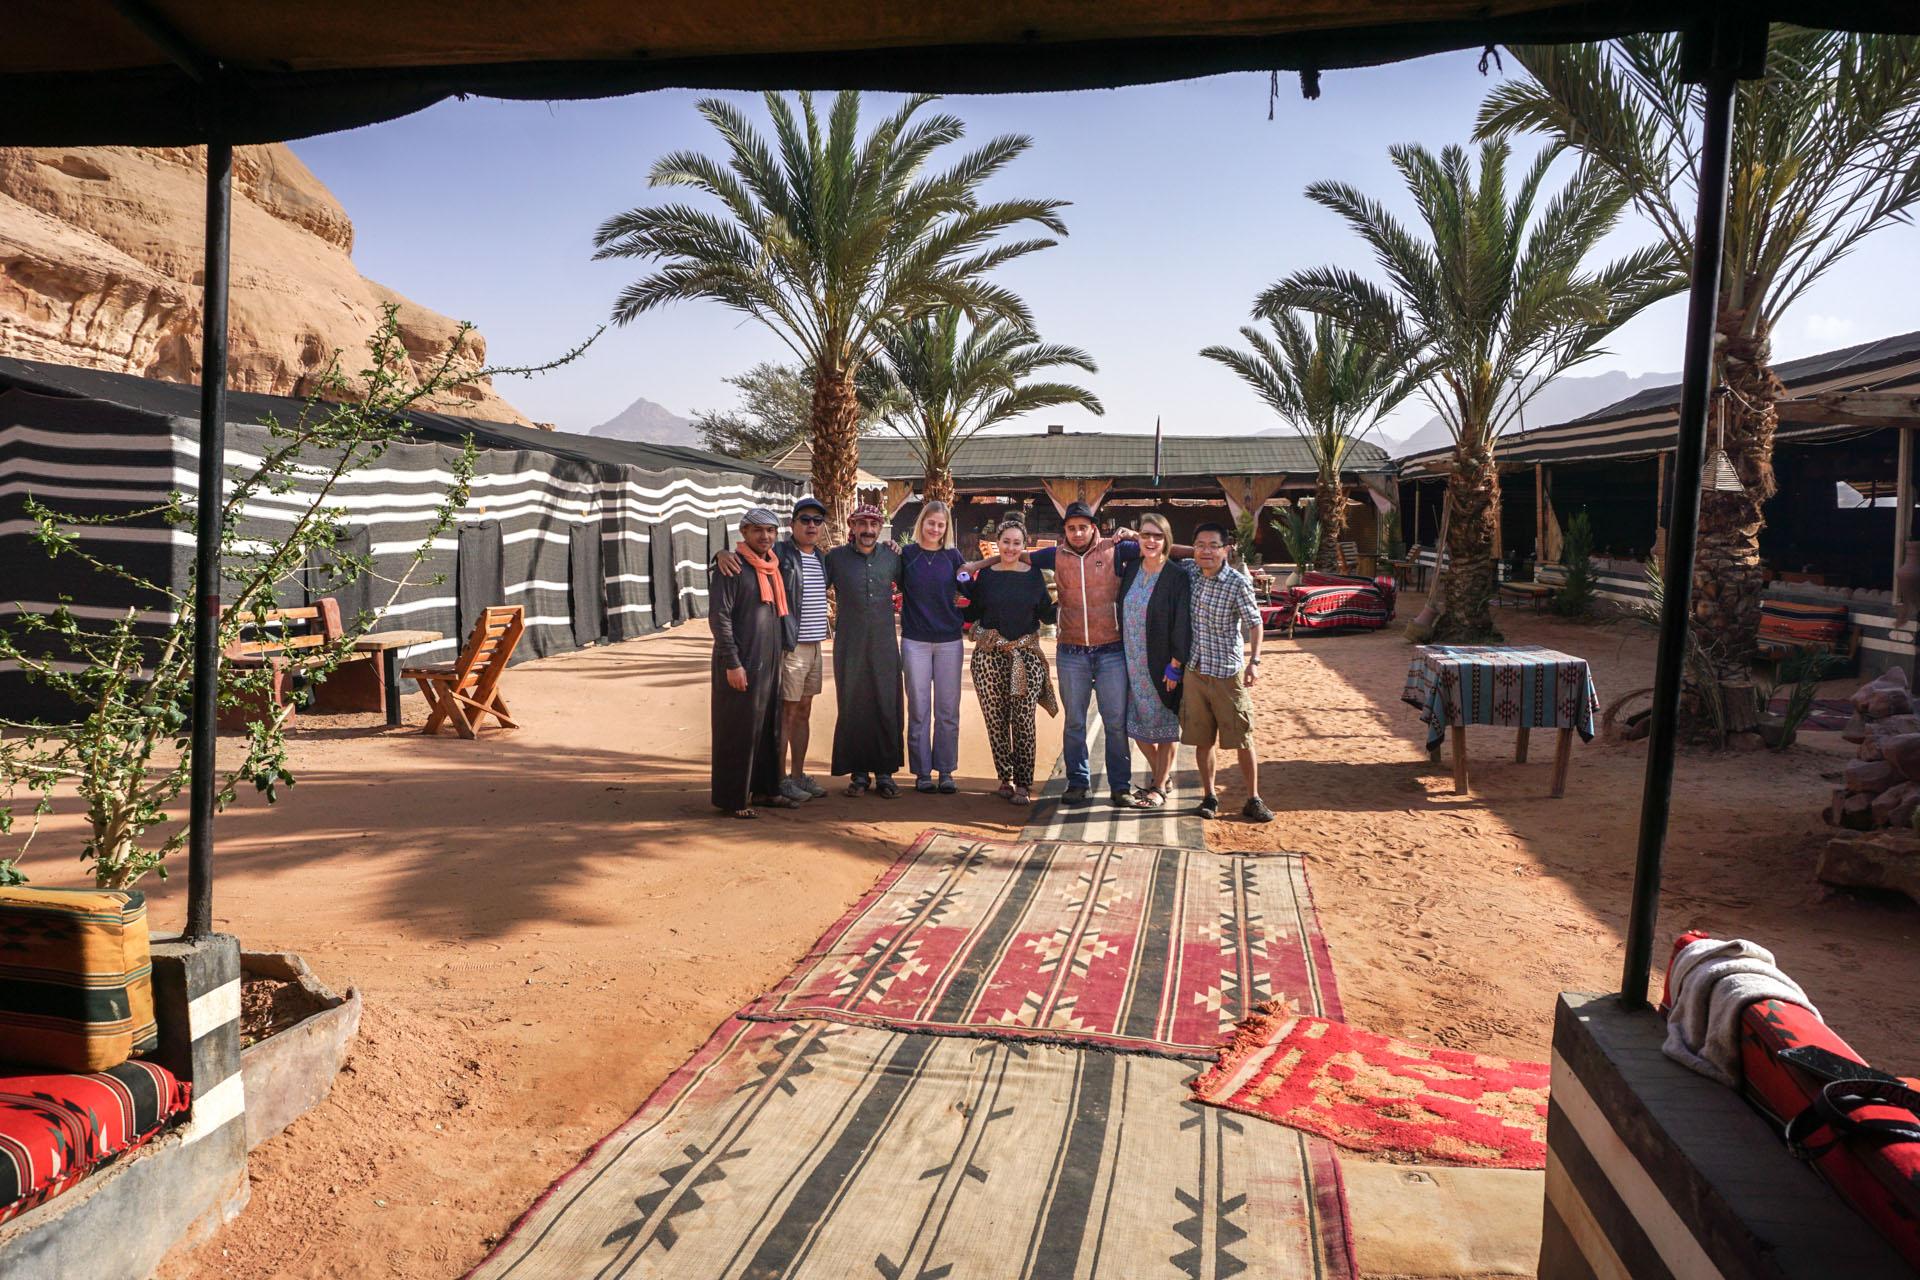 Our desert camp in Wadi Rum